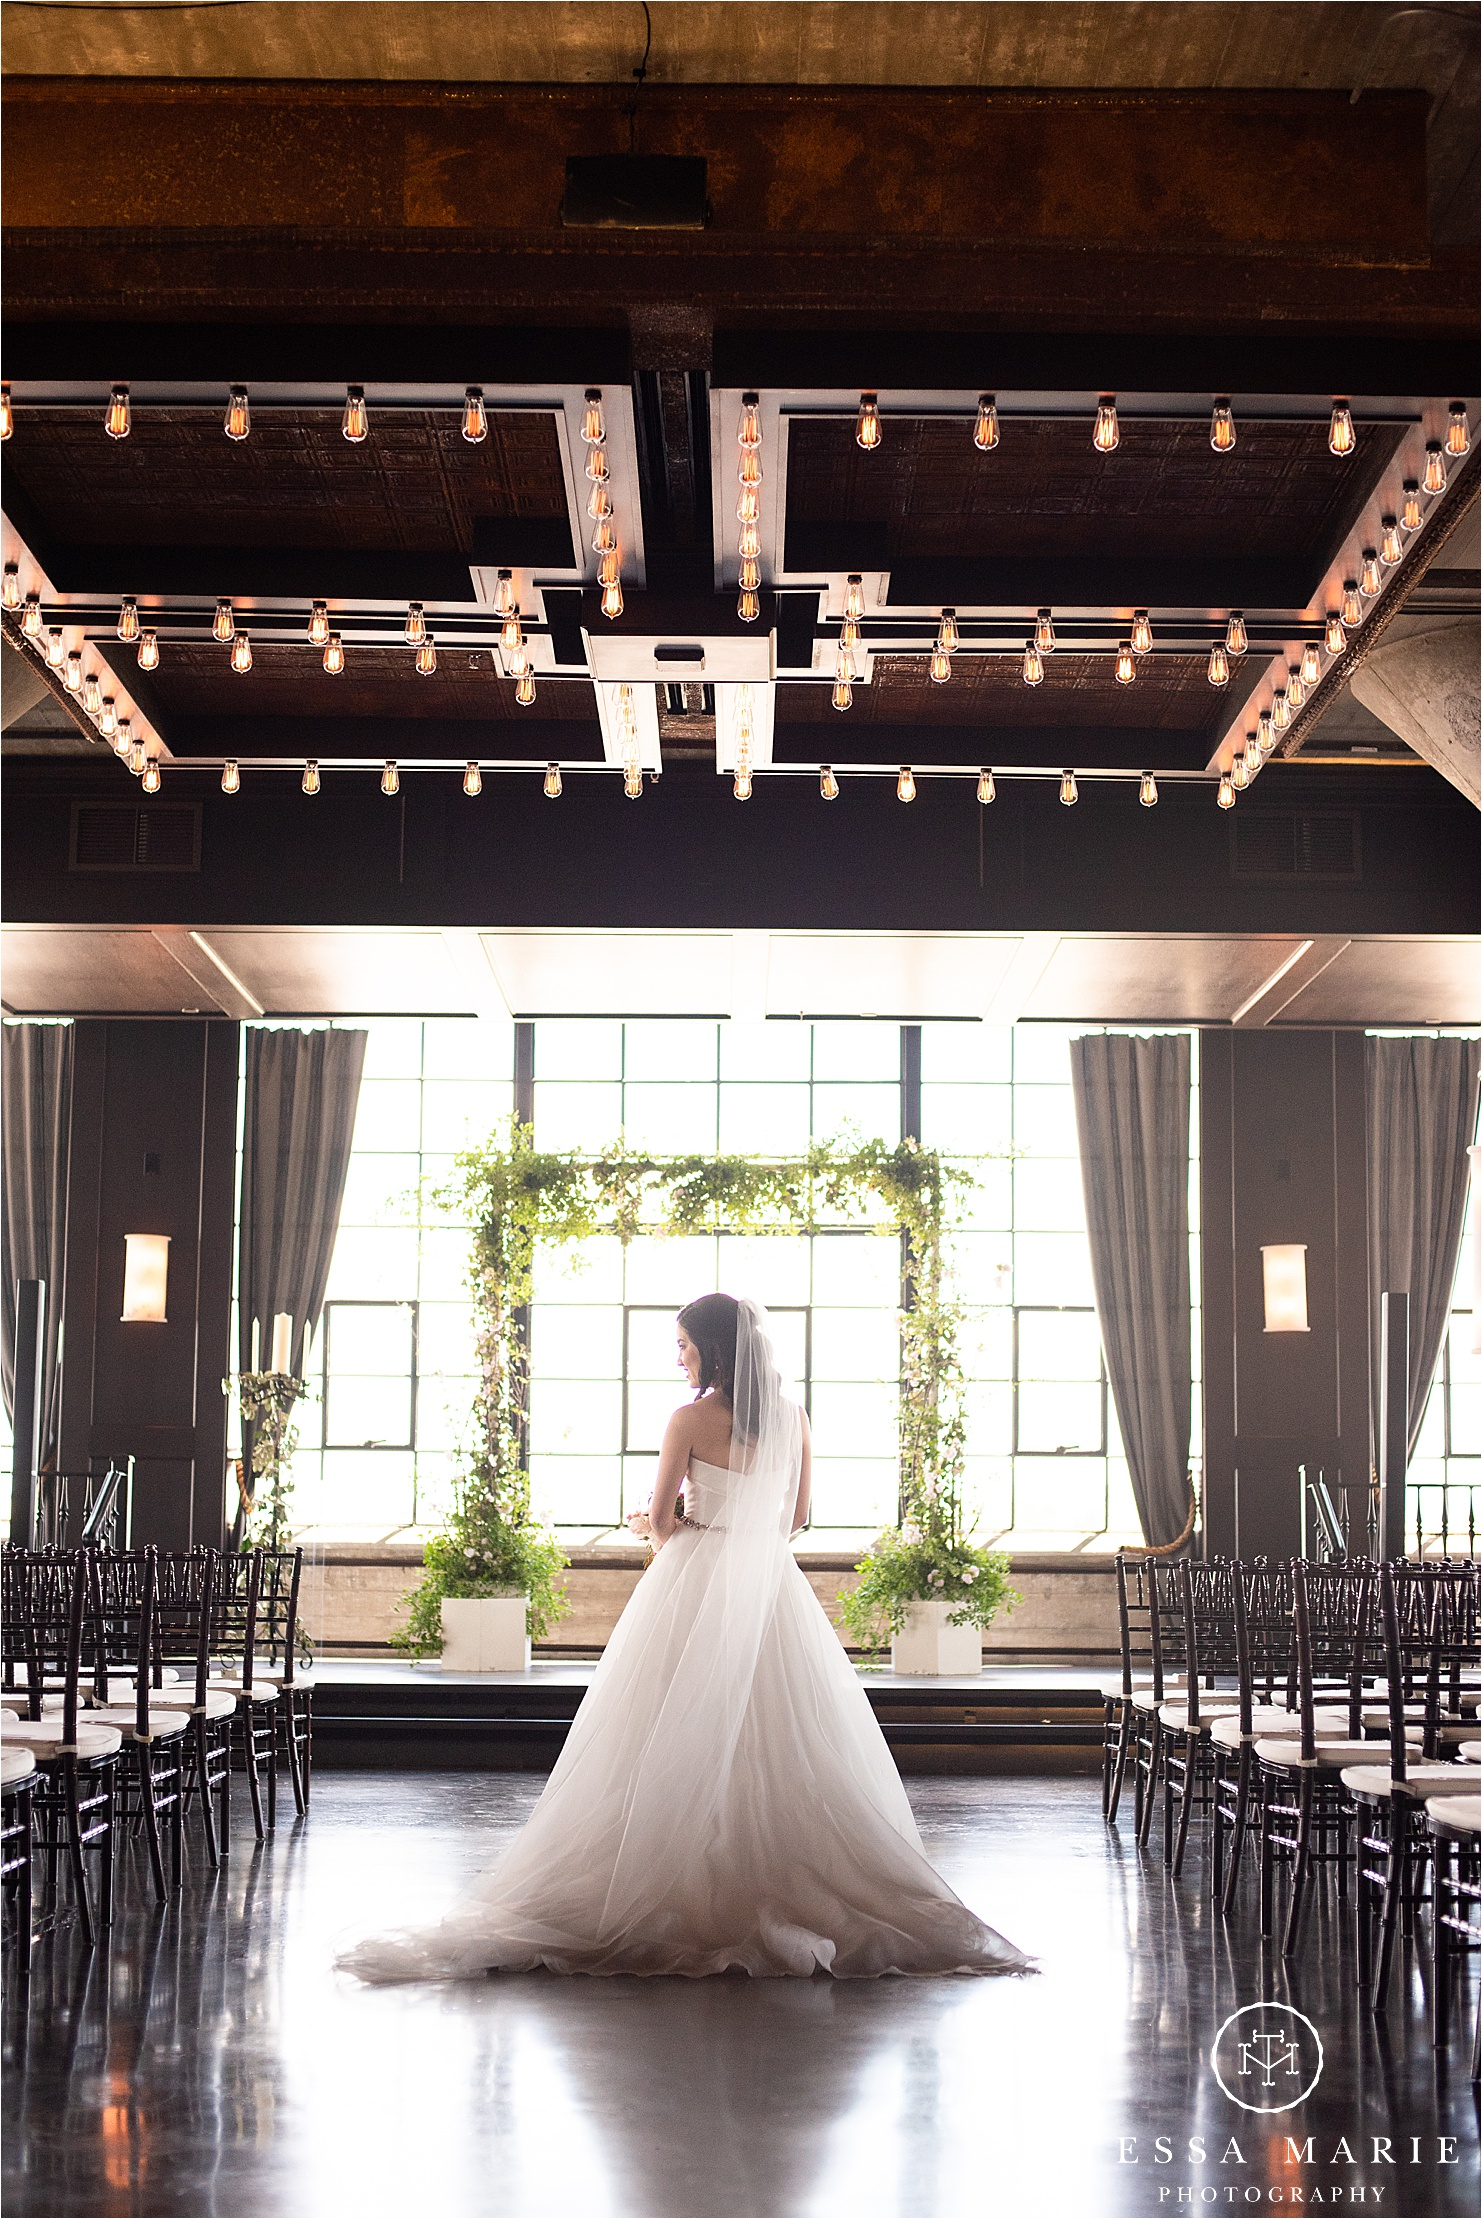 Tessa_marie_weddings_houston_wedding_photographer_The_astorian_0044.jpg